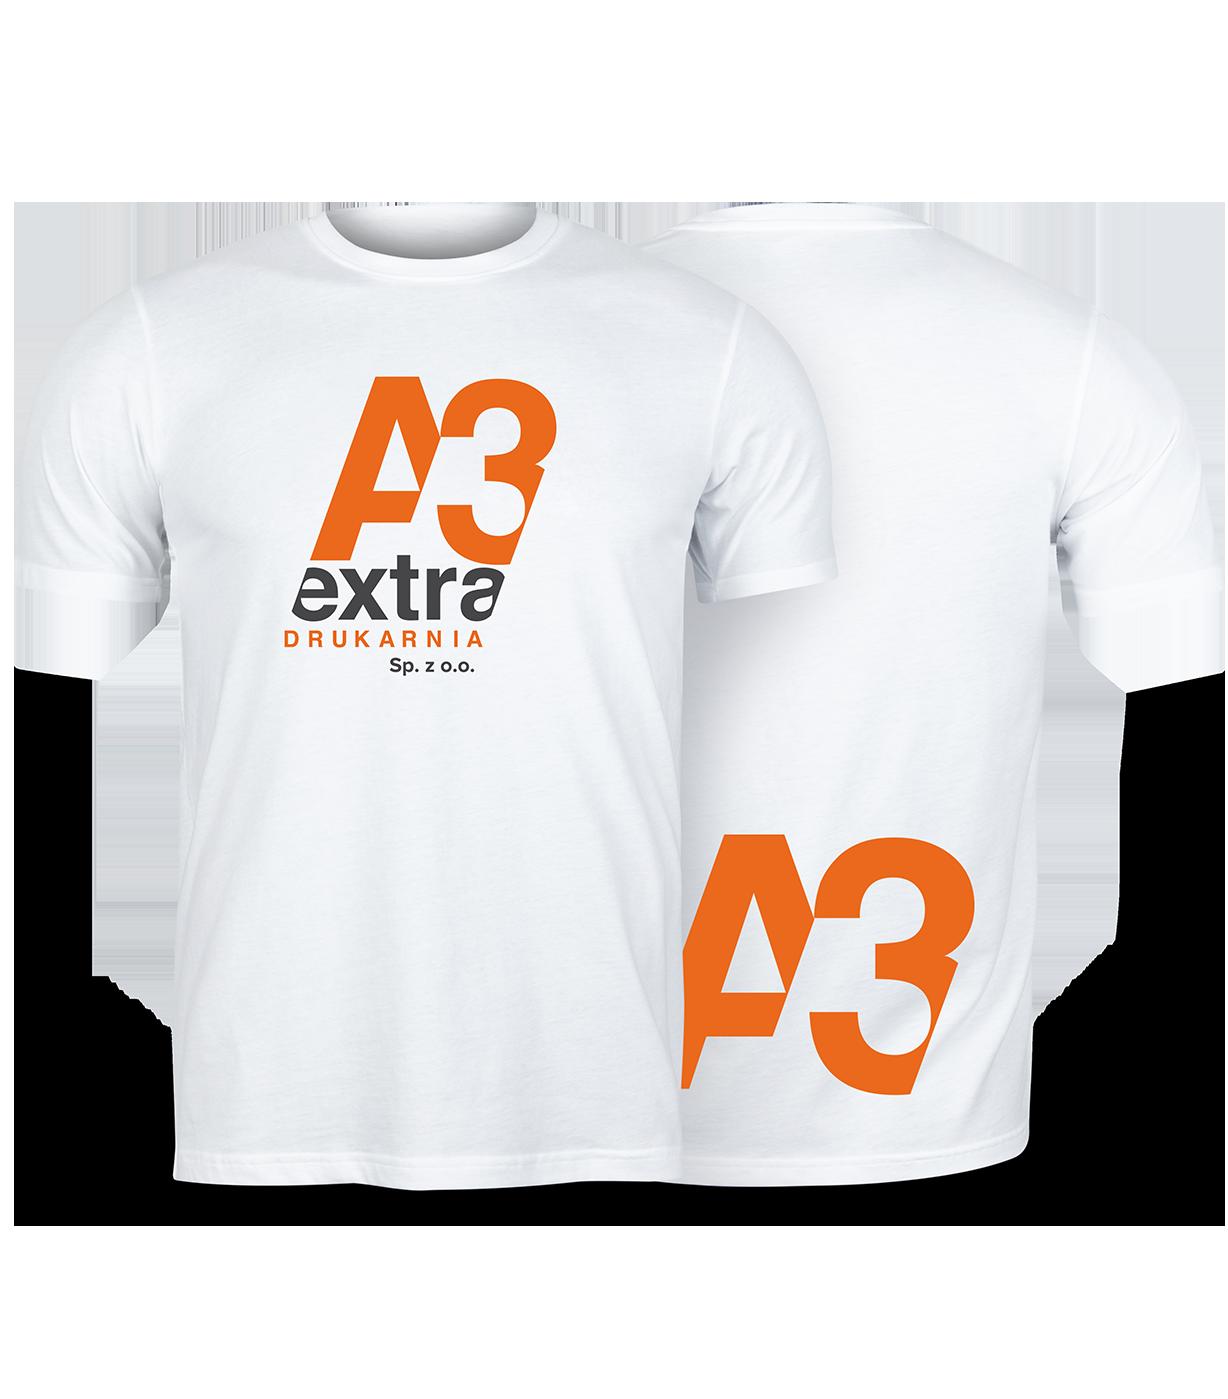 t-shirt z logo drukarni A3extra